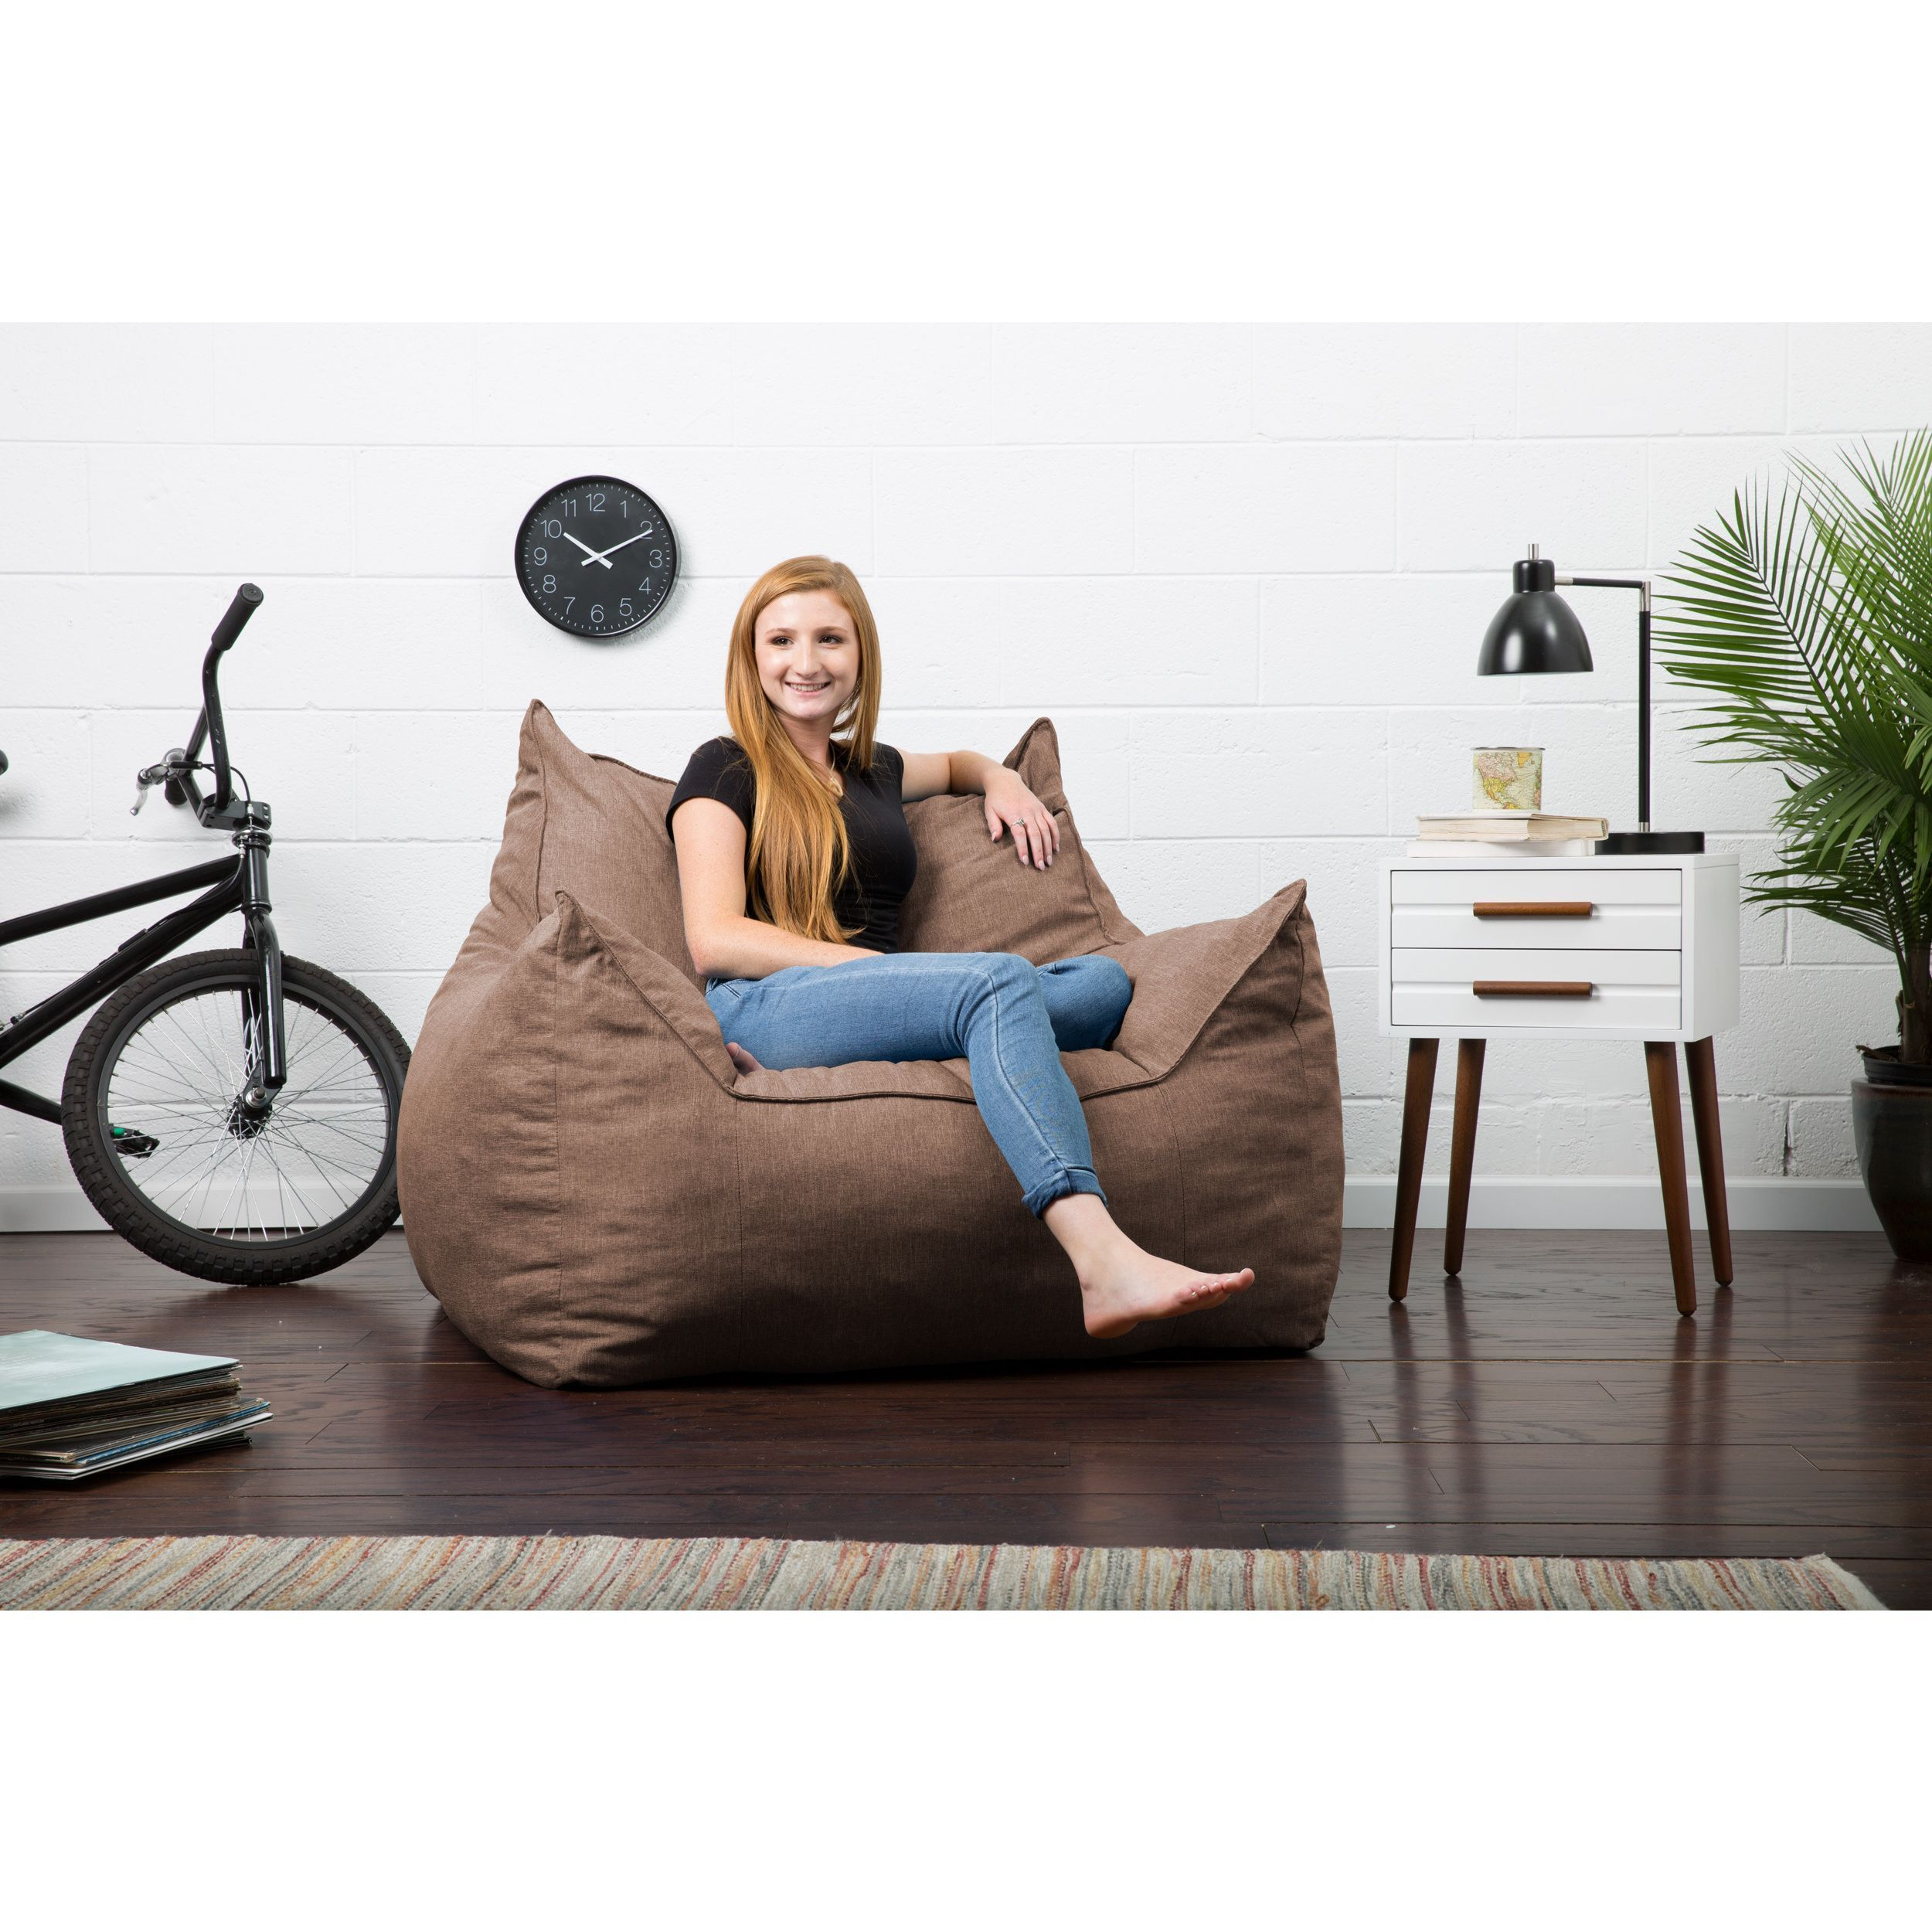 Foam Bean Bag Chair Hanging Outdoor Uk Comfort Research Fufsack Big Joe Lux Imperial Solid Colored Linen Memory Lounger